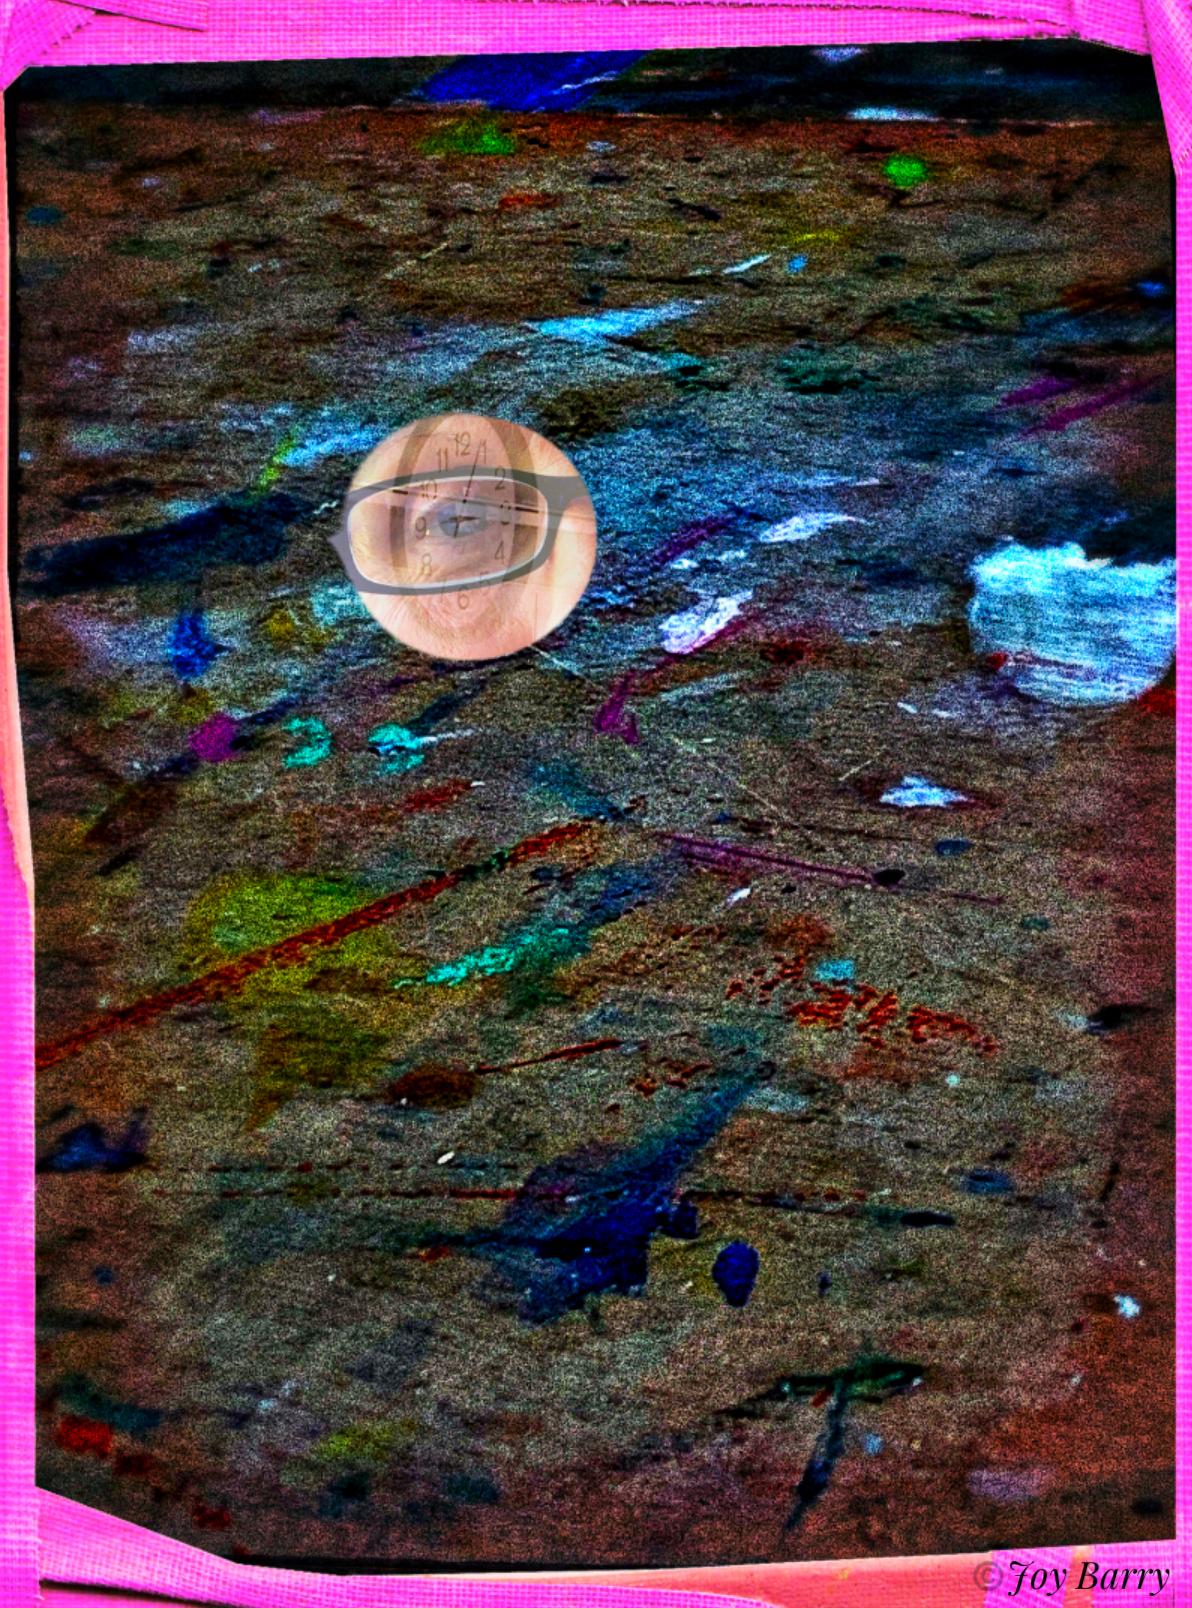 April 6, 2019 - Foveal vision.